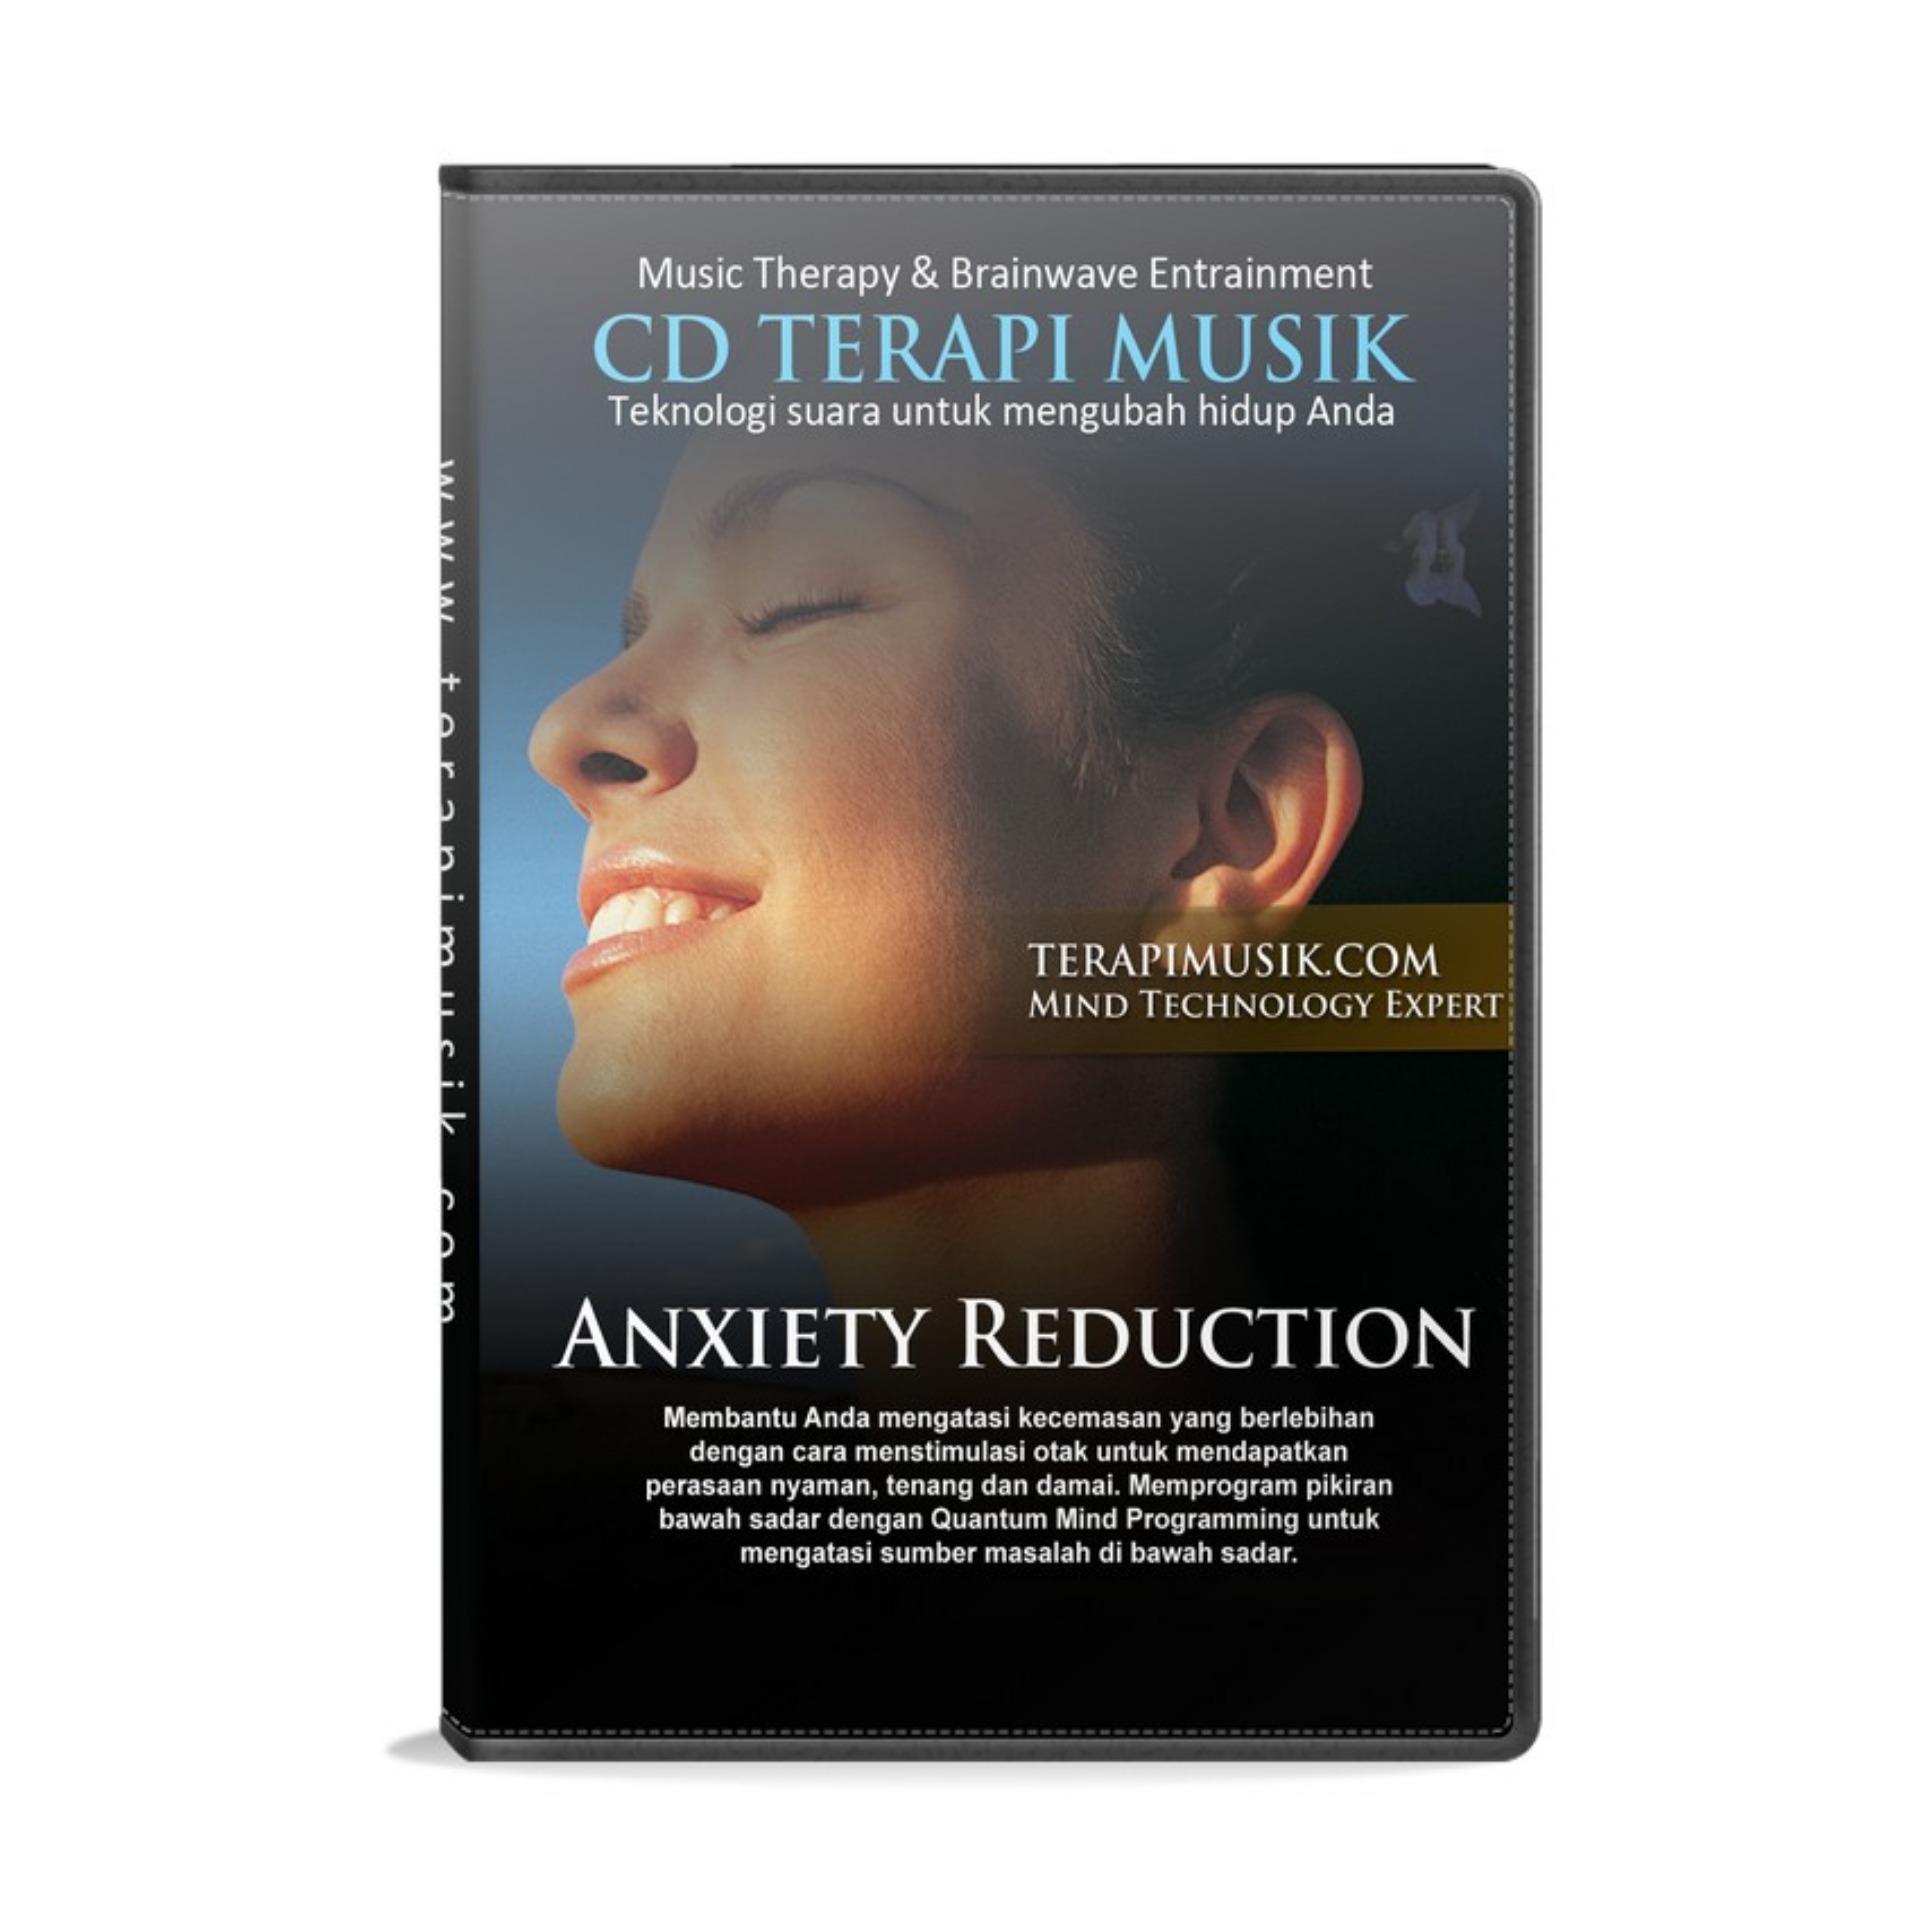 Terapi Musik Anxiety Reduction (terapi Untuk Mengatasi Kecemasan) By Terapi Musik.